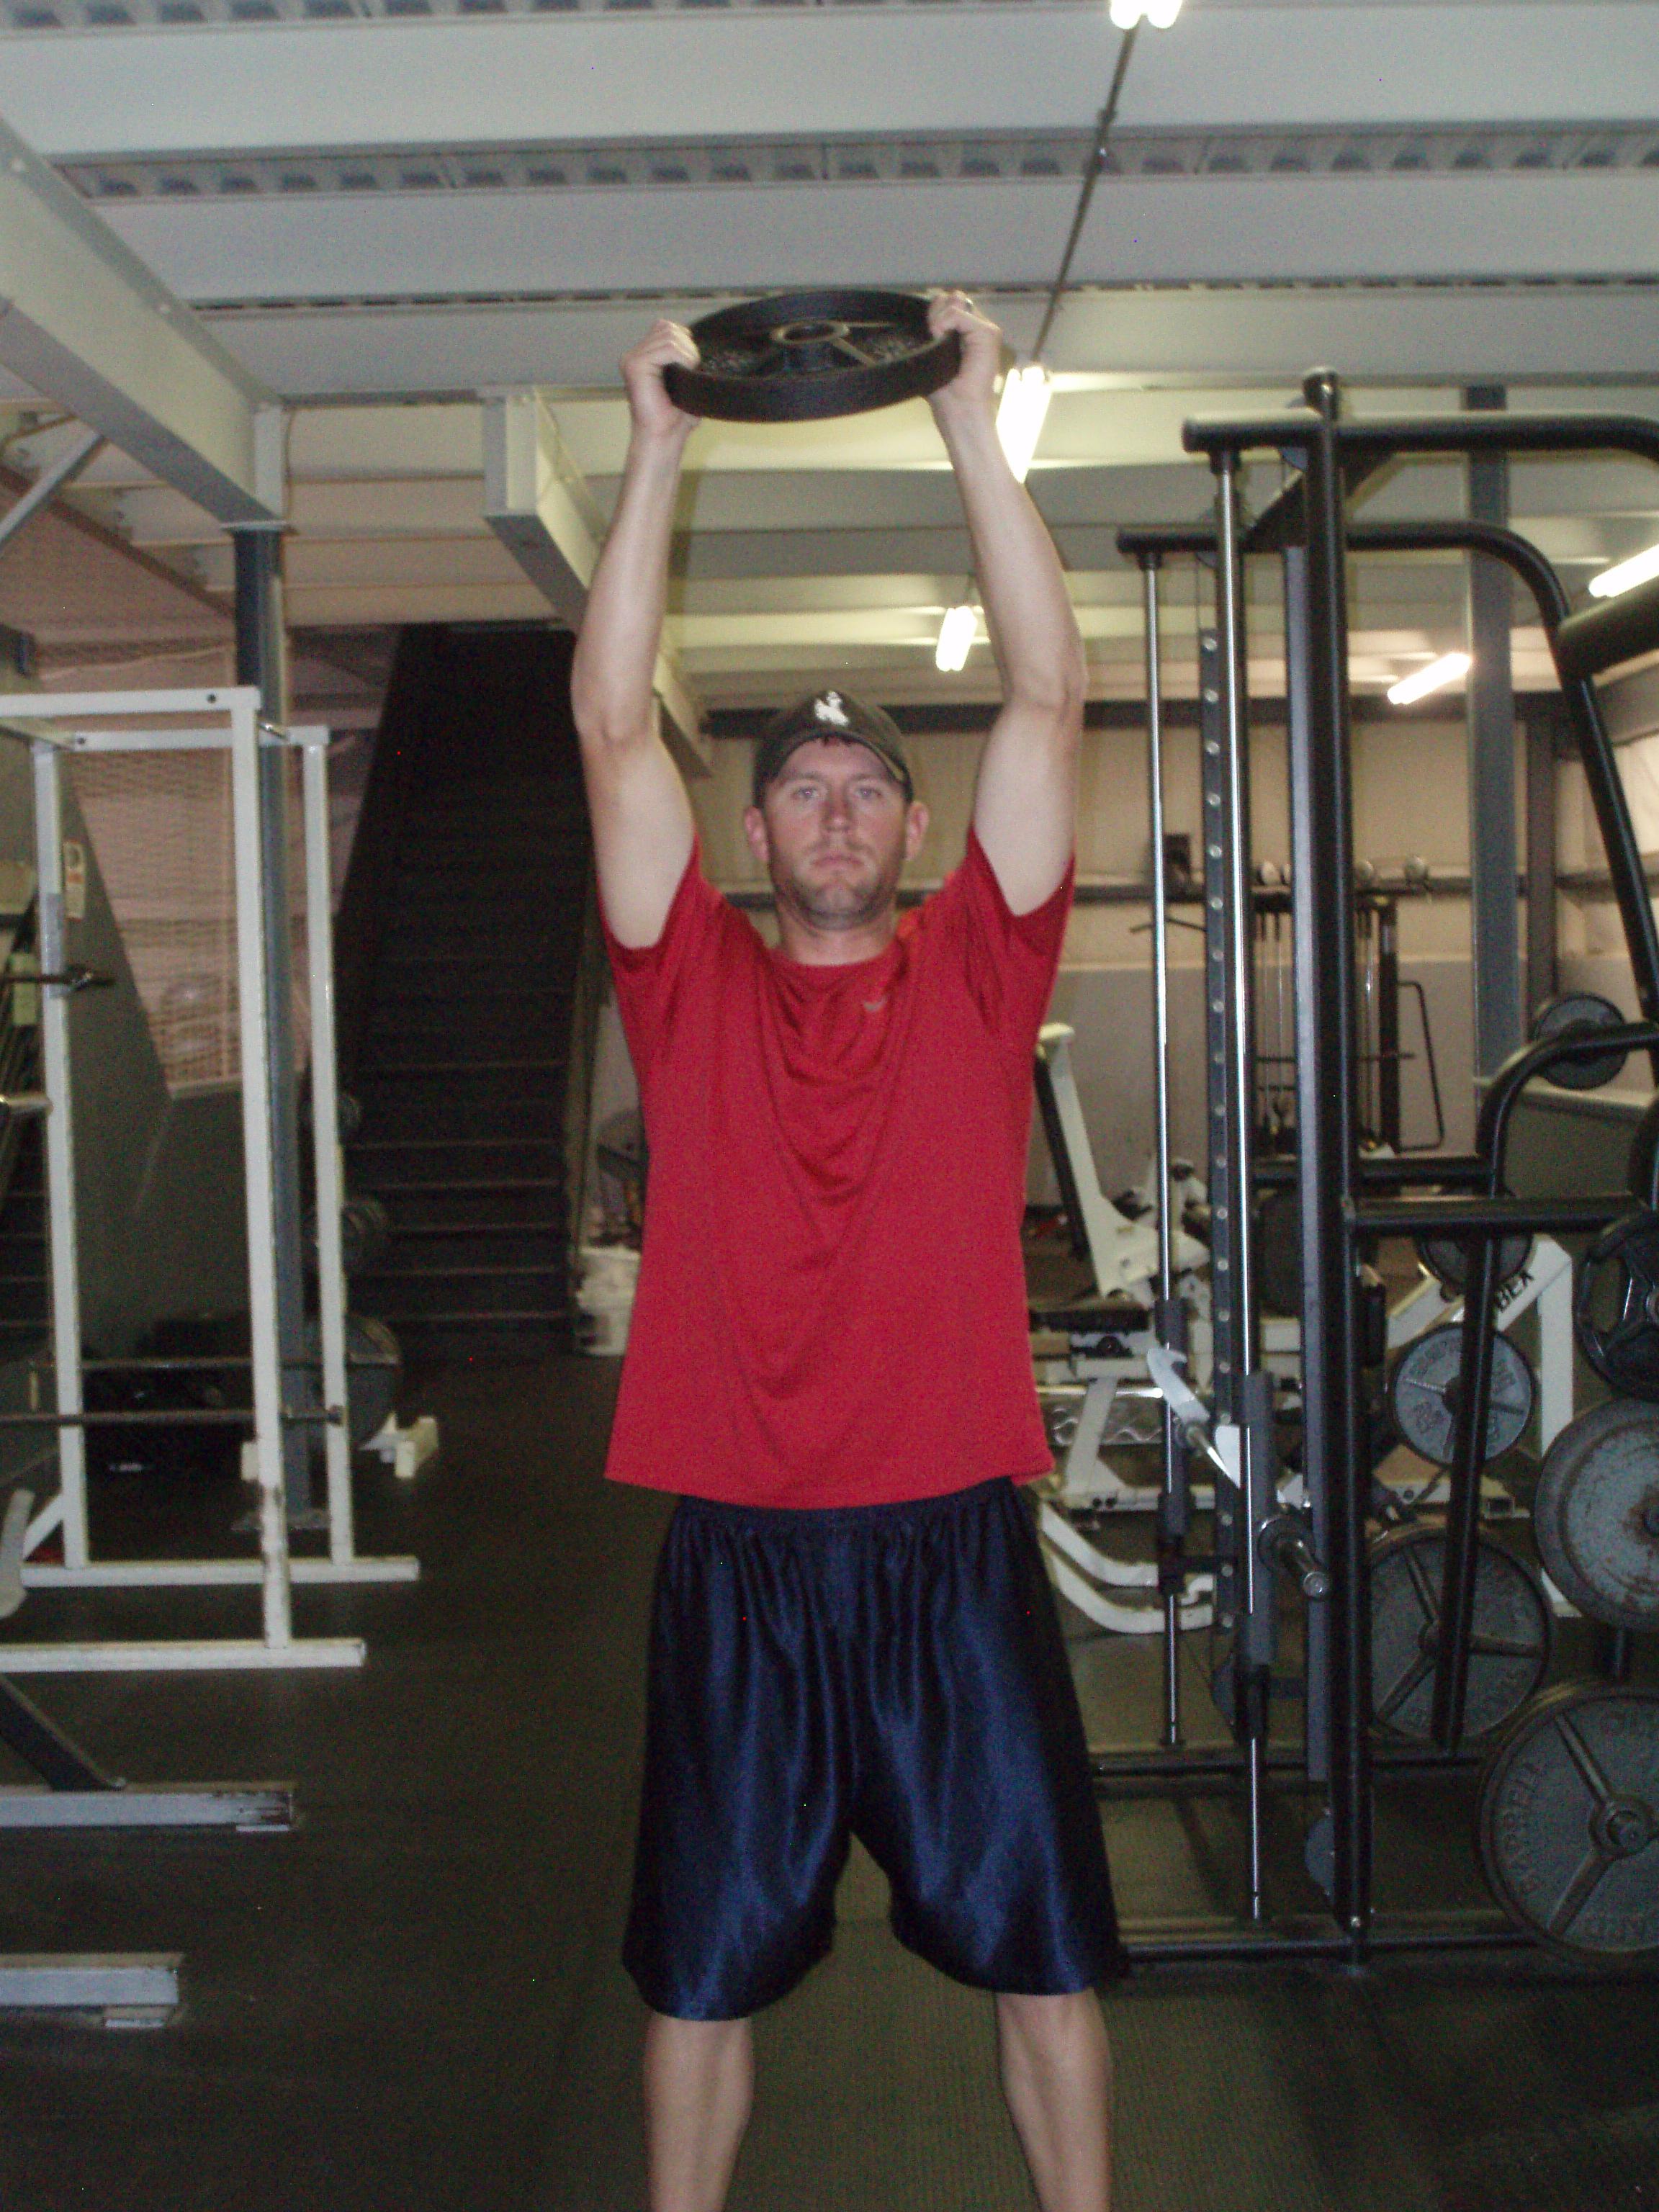 The Weight Plate Horseshoe